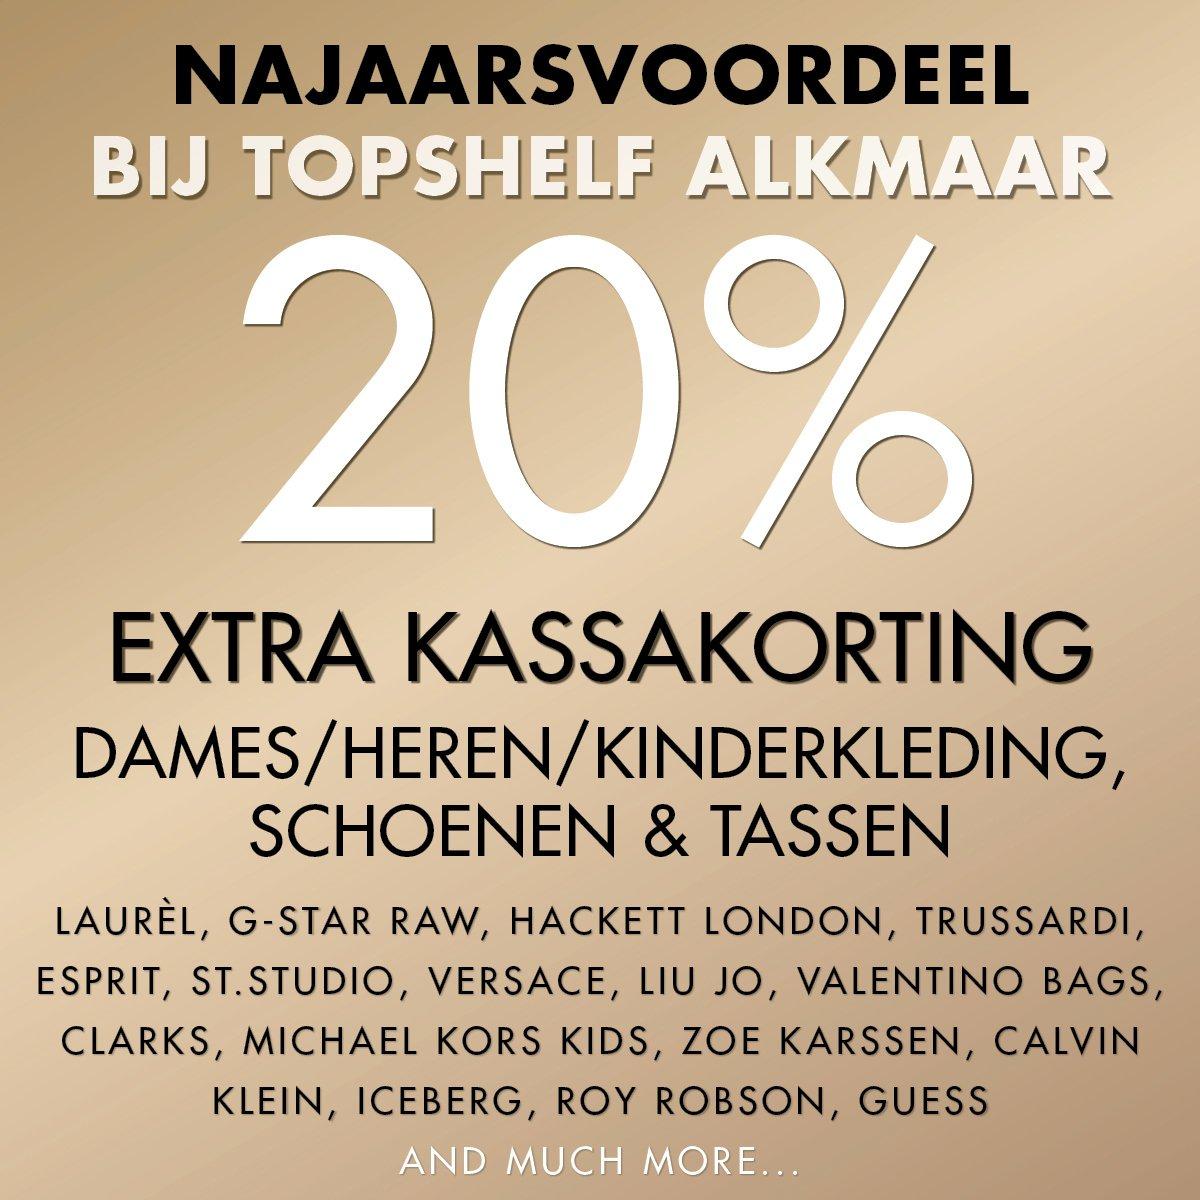 Kinderkleding Alkmaar.Sportsworld Megastores On Twitter Vanaf Vandaag 20 Extra